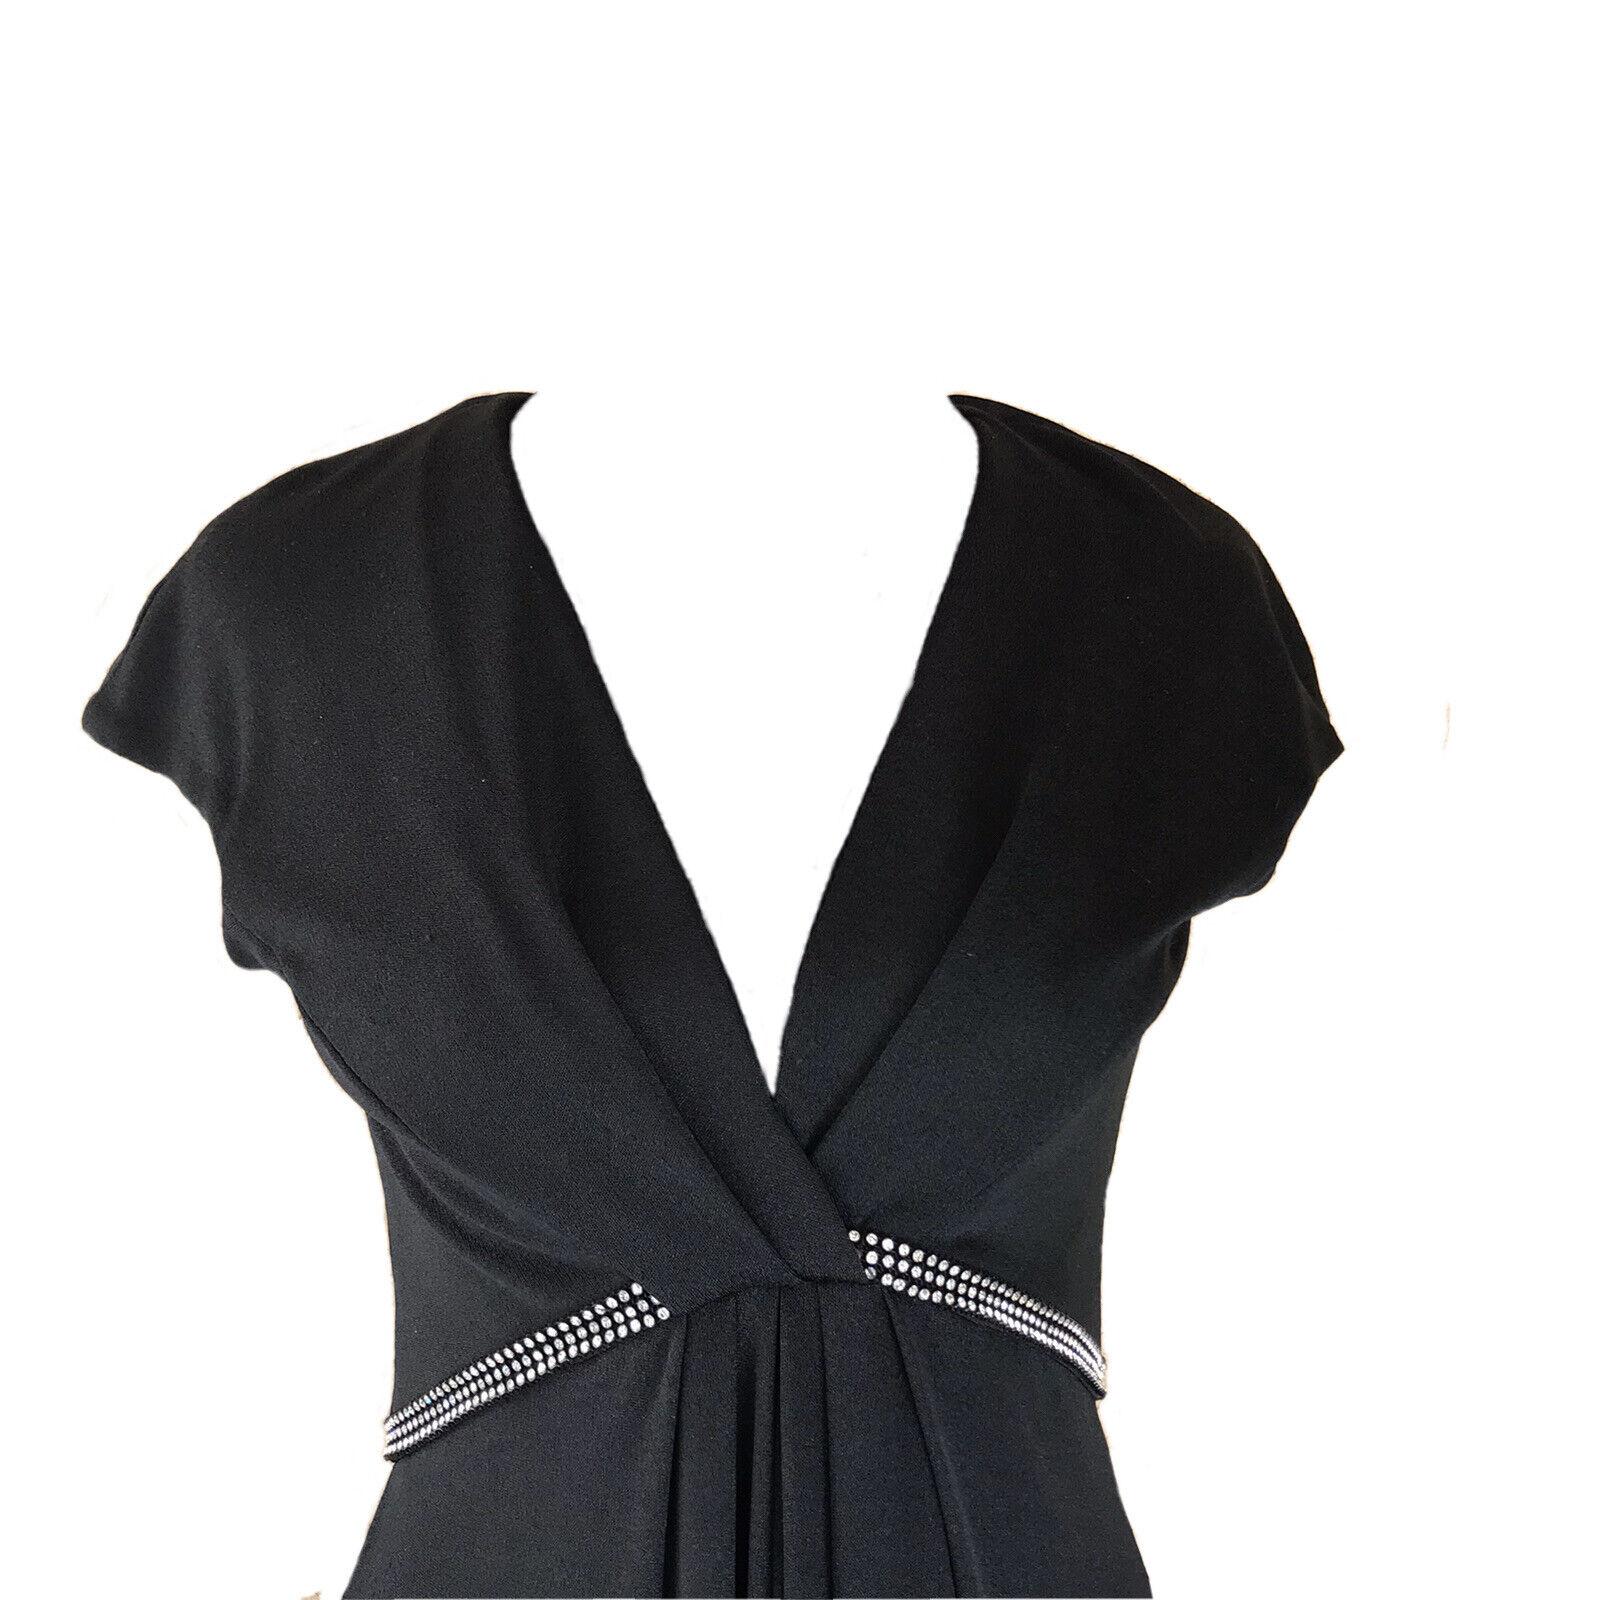 Vintage Luis Estevez Dress Eva Gabor Look Label B… - image 2